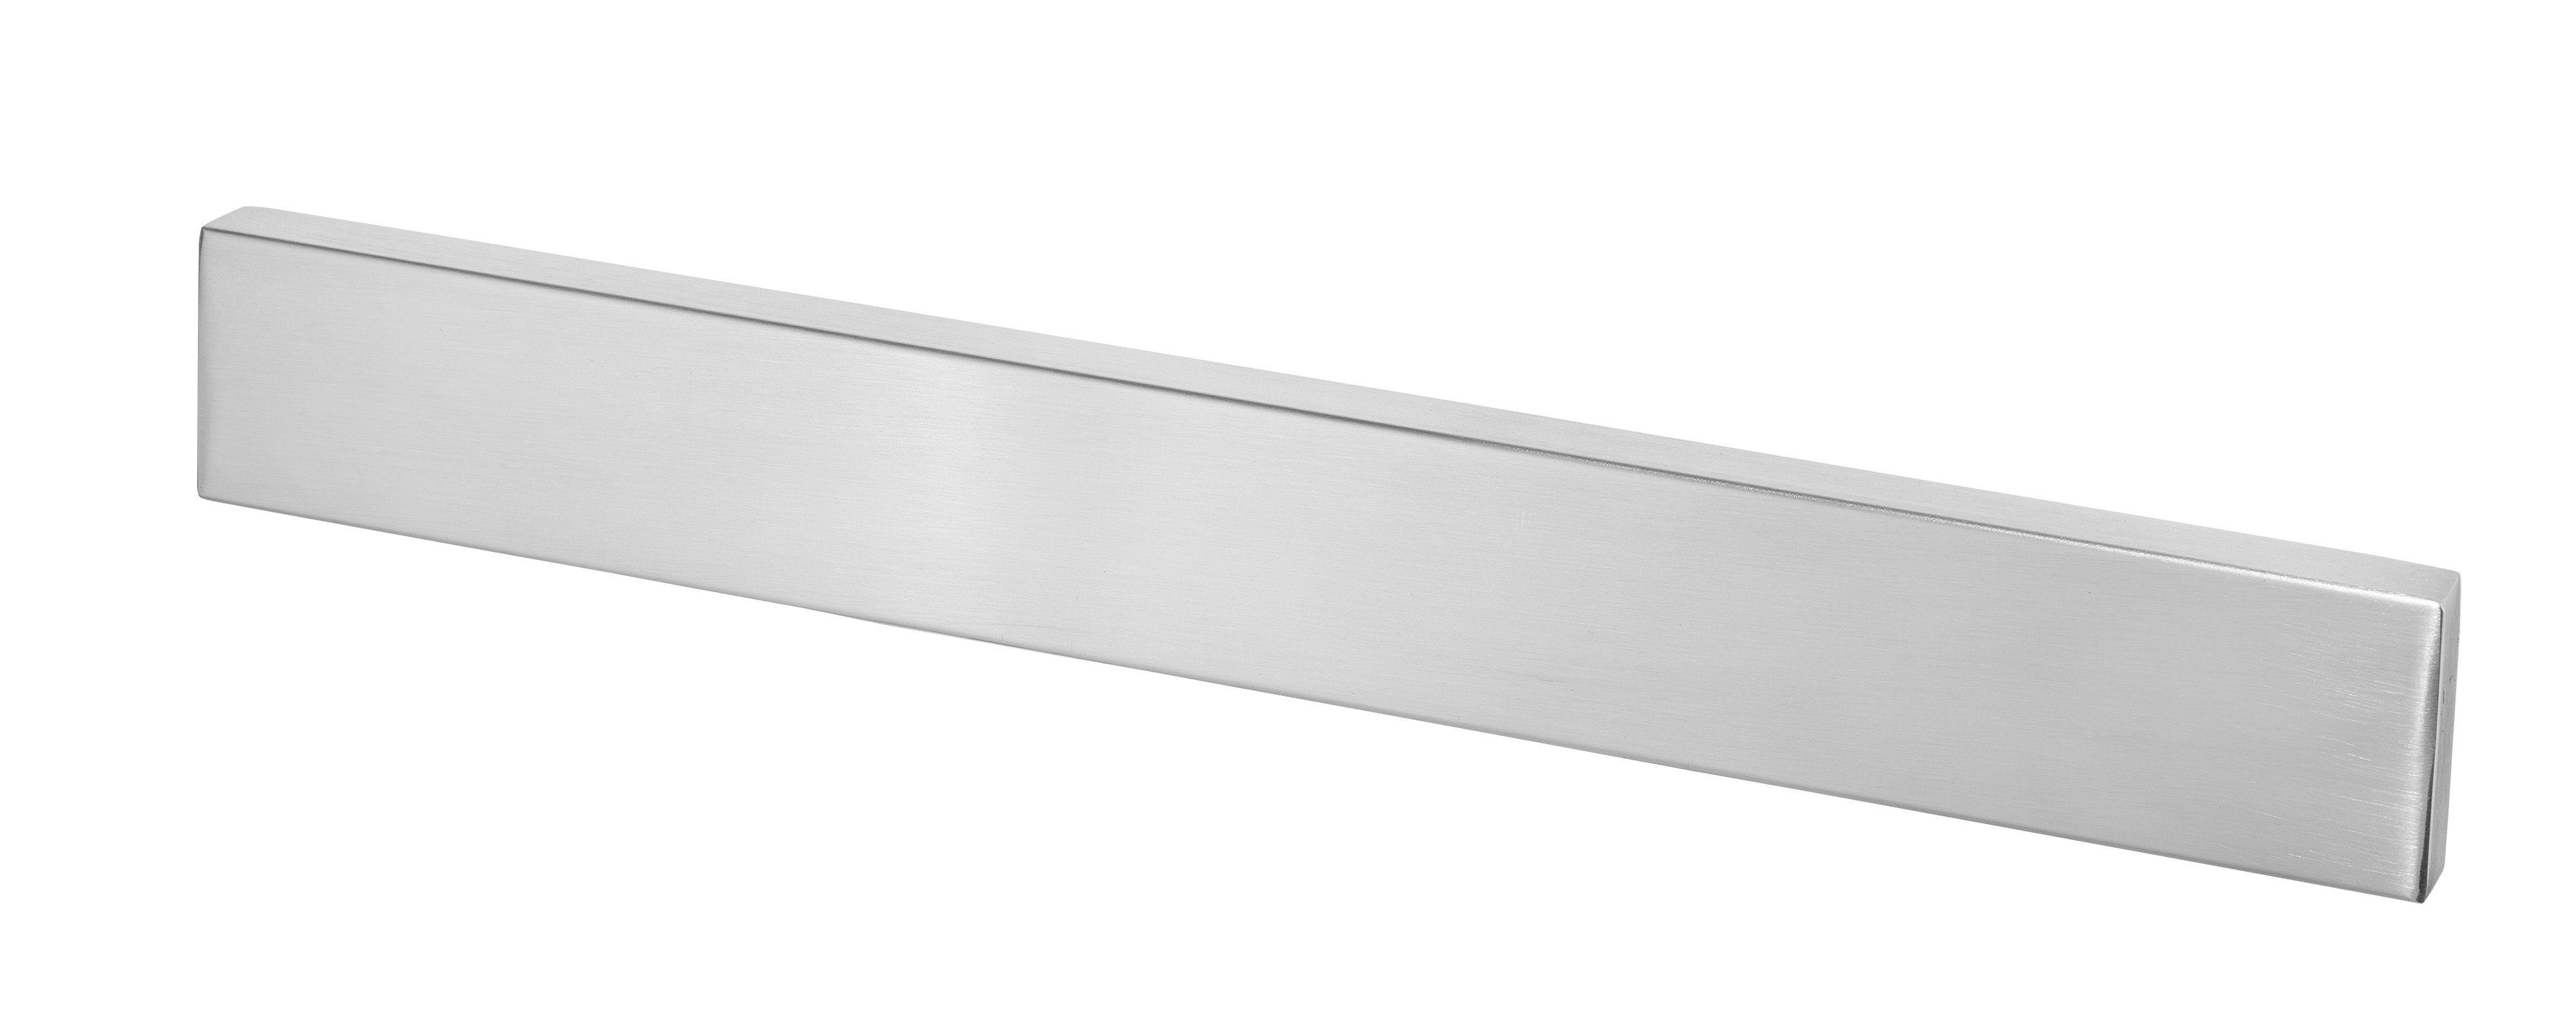 Cooke & Lewis Chrome Effect Magnetic Knife Holder | Departments | DIY at B&Q